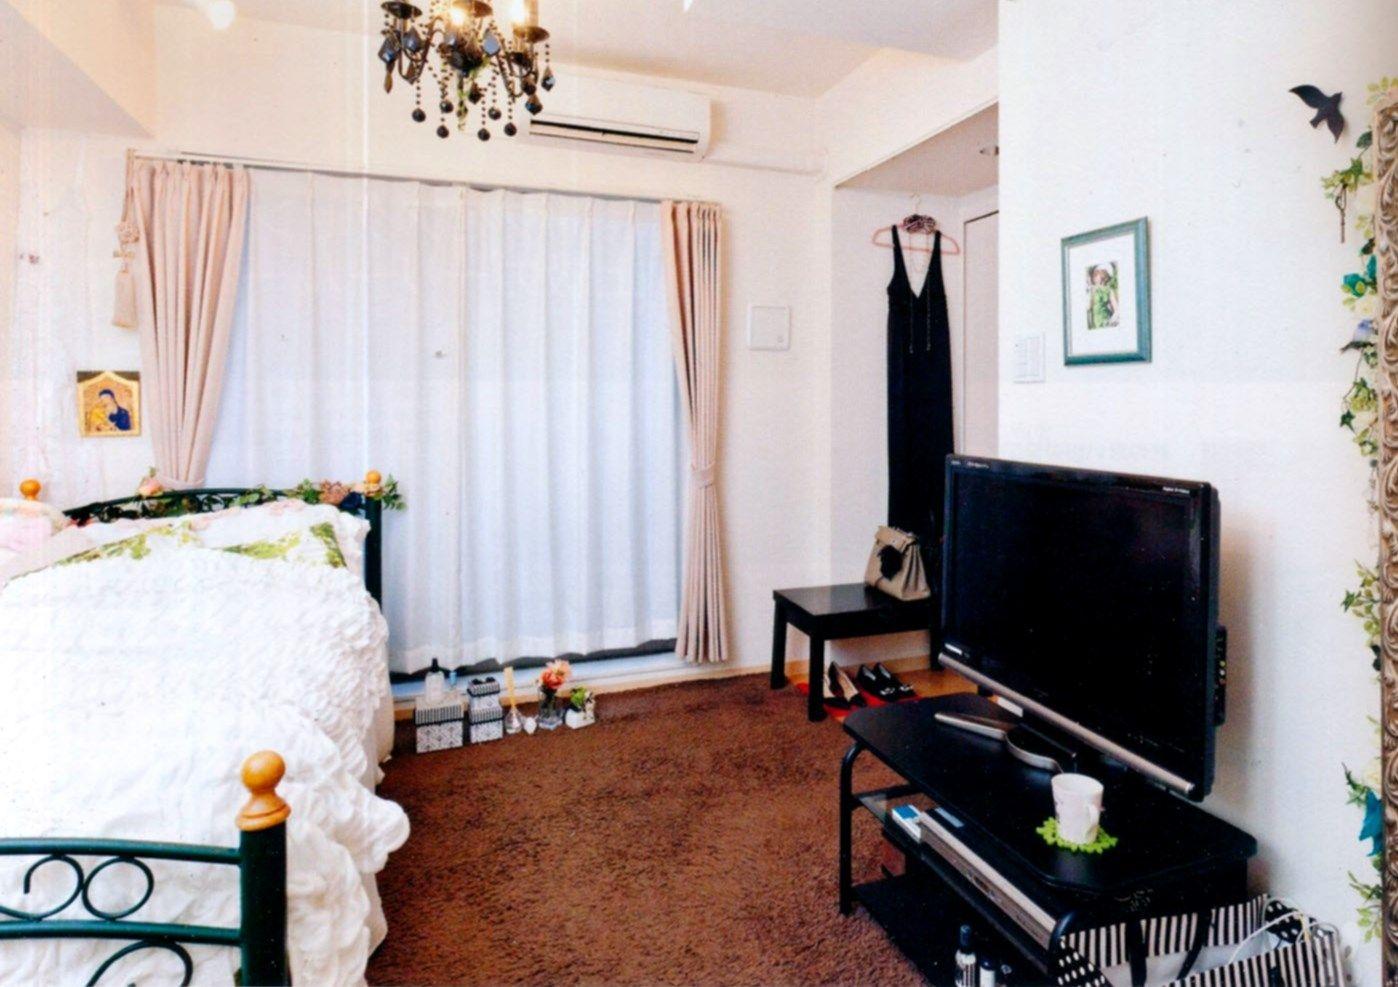 3 bedroom loft  pretty apartment loft cute red carpet white walls purses